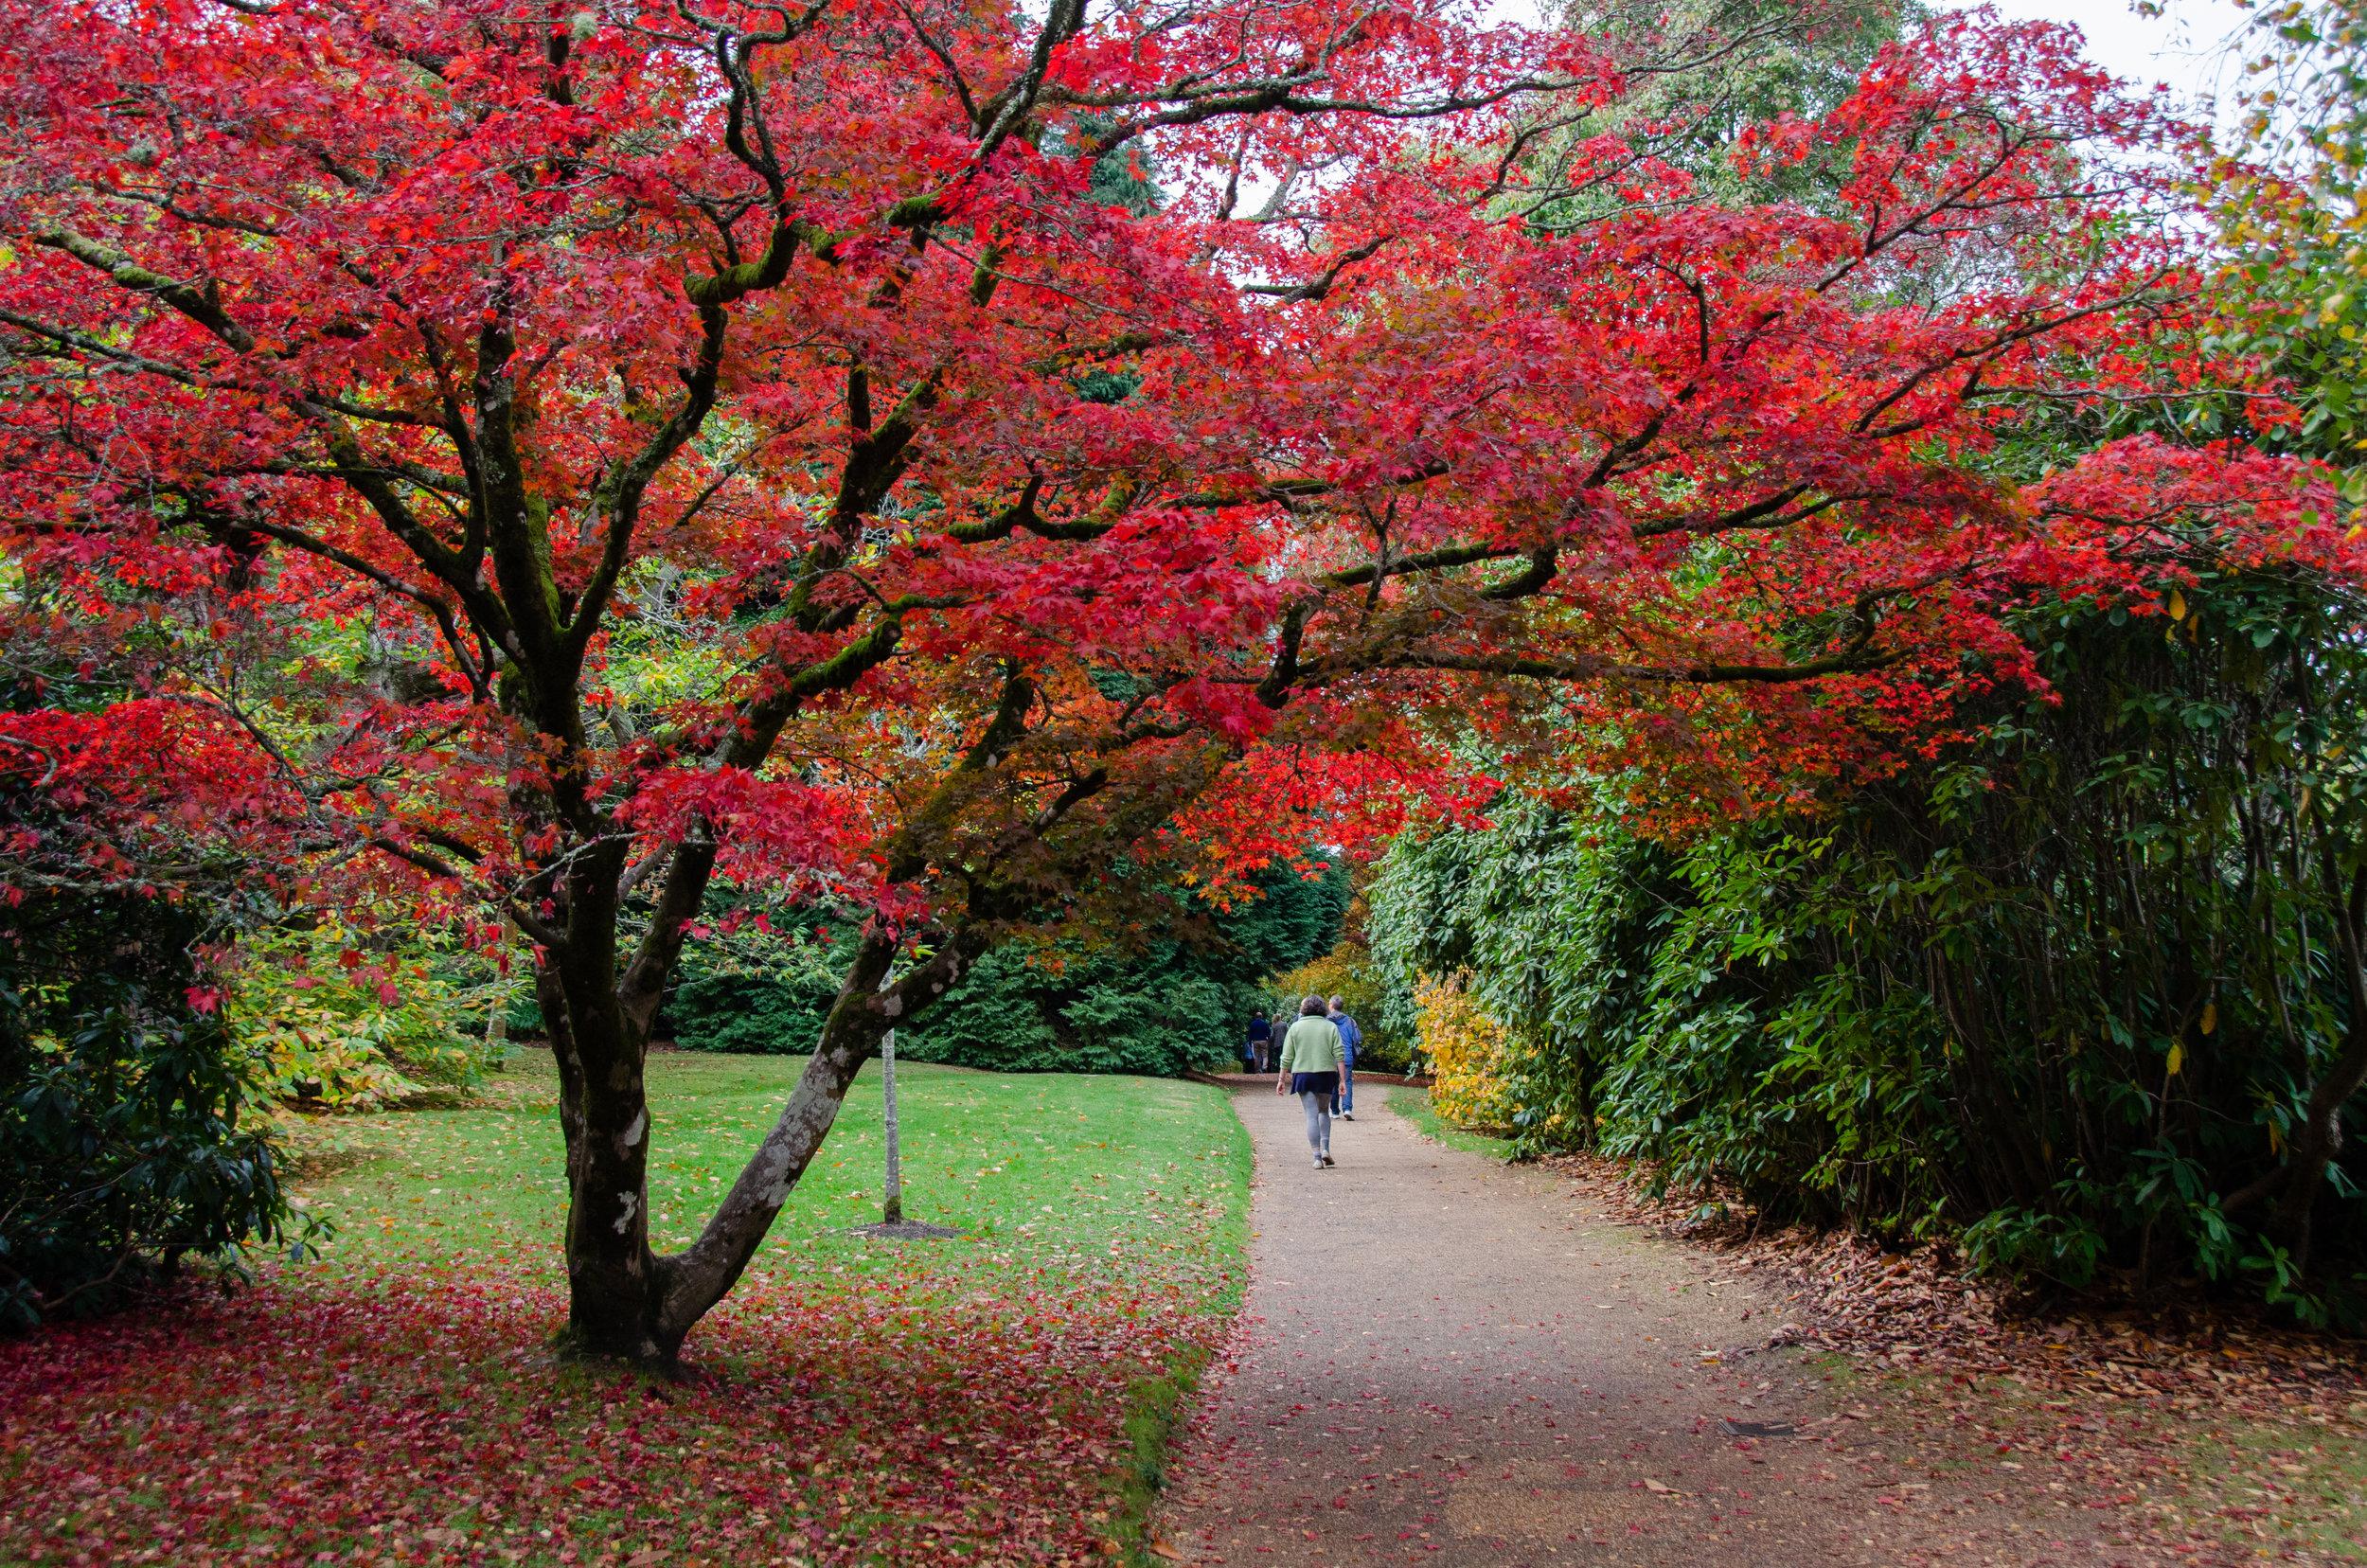 A stunning Japanese maple